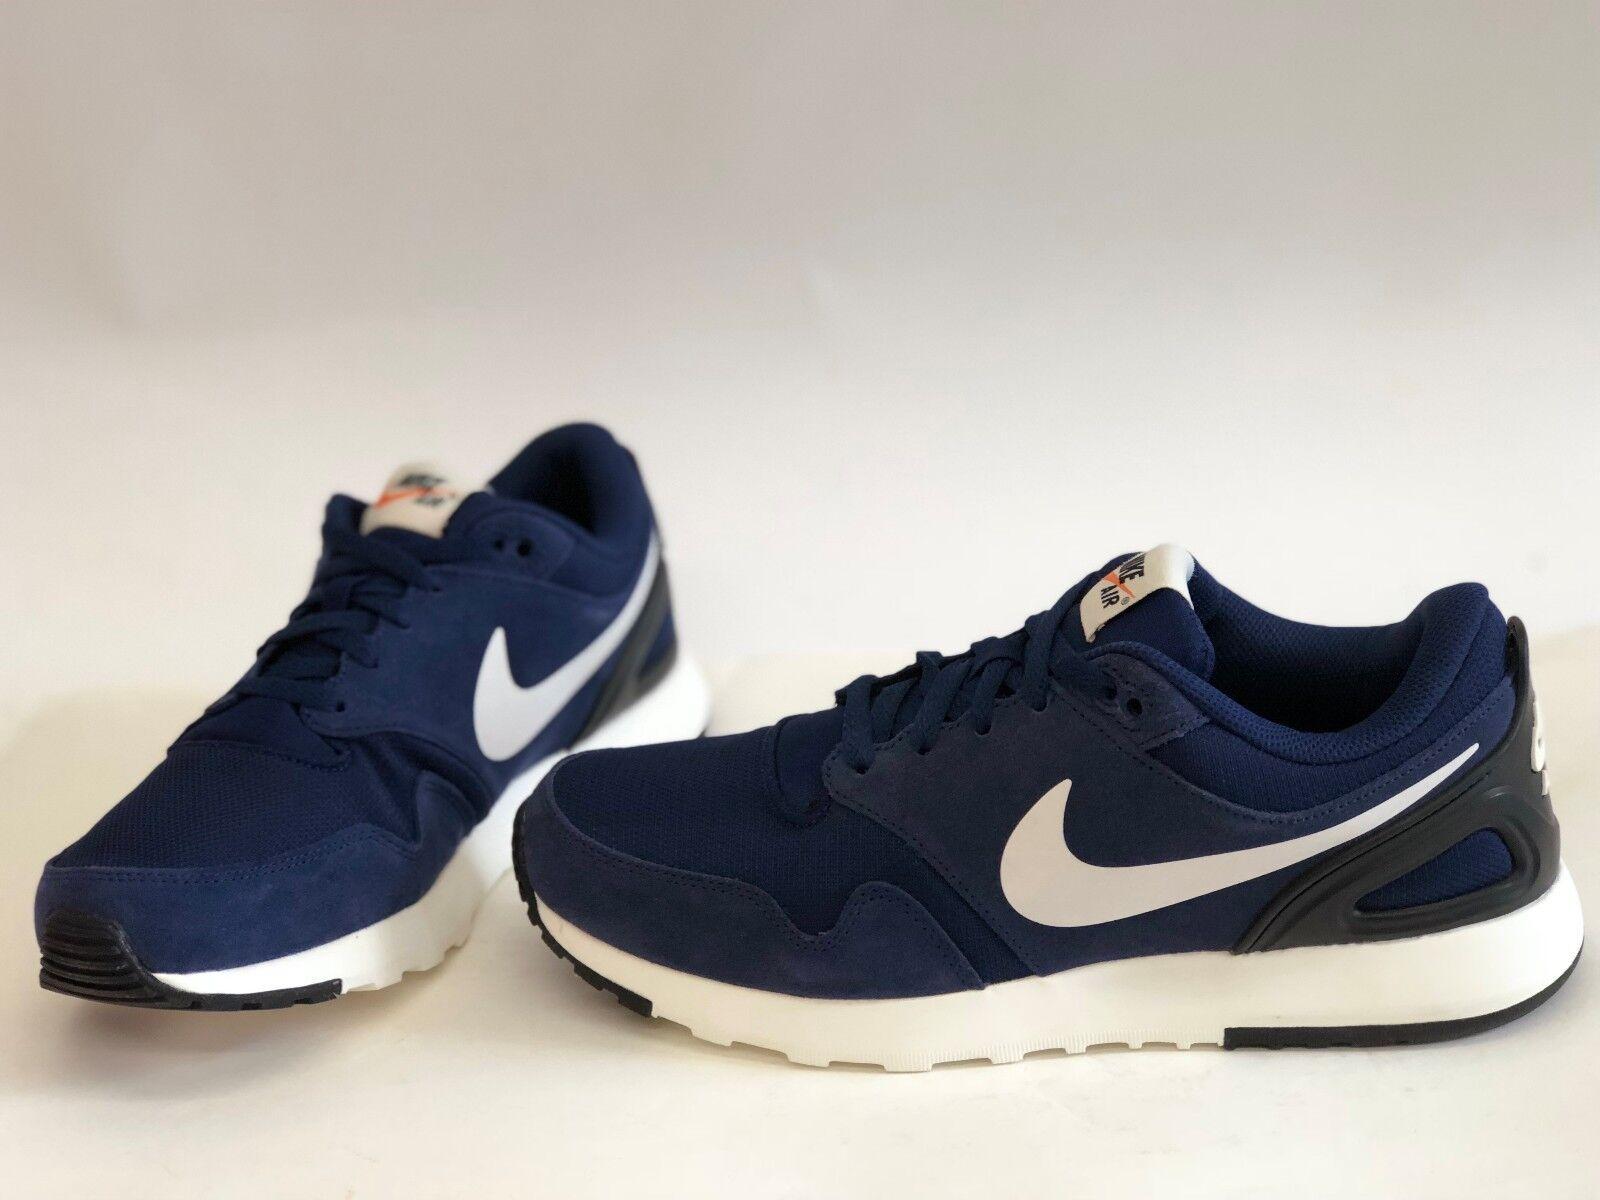 Pennino Uomo taglia 10 blu nike air vibenna correndo scarpe blu 10 866069-400 0cb24a